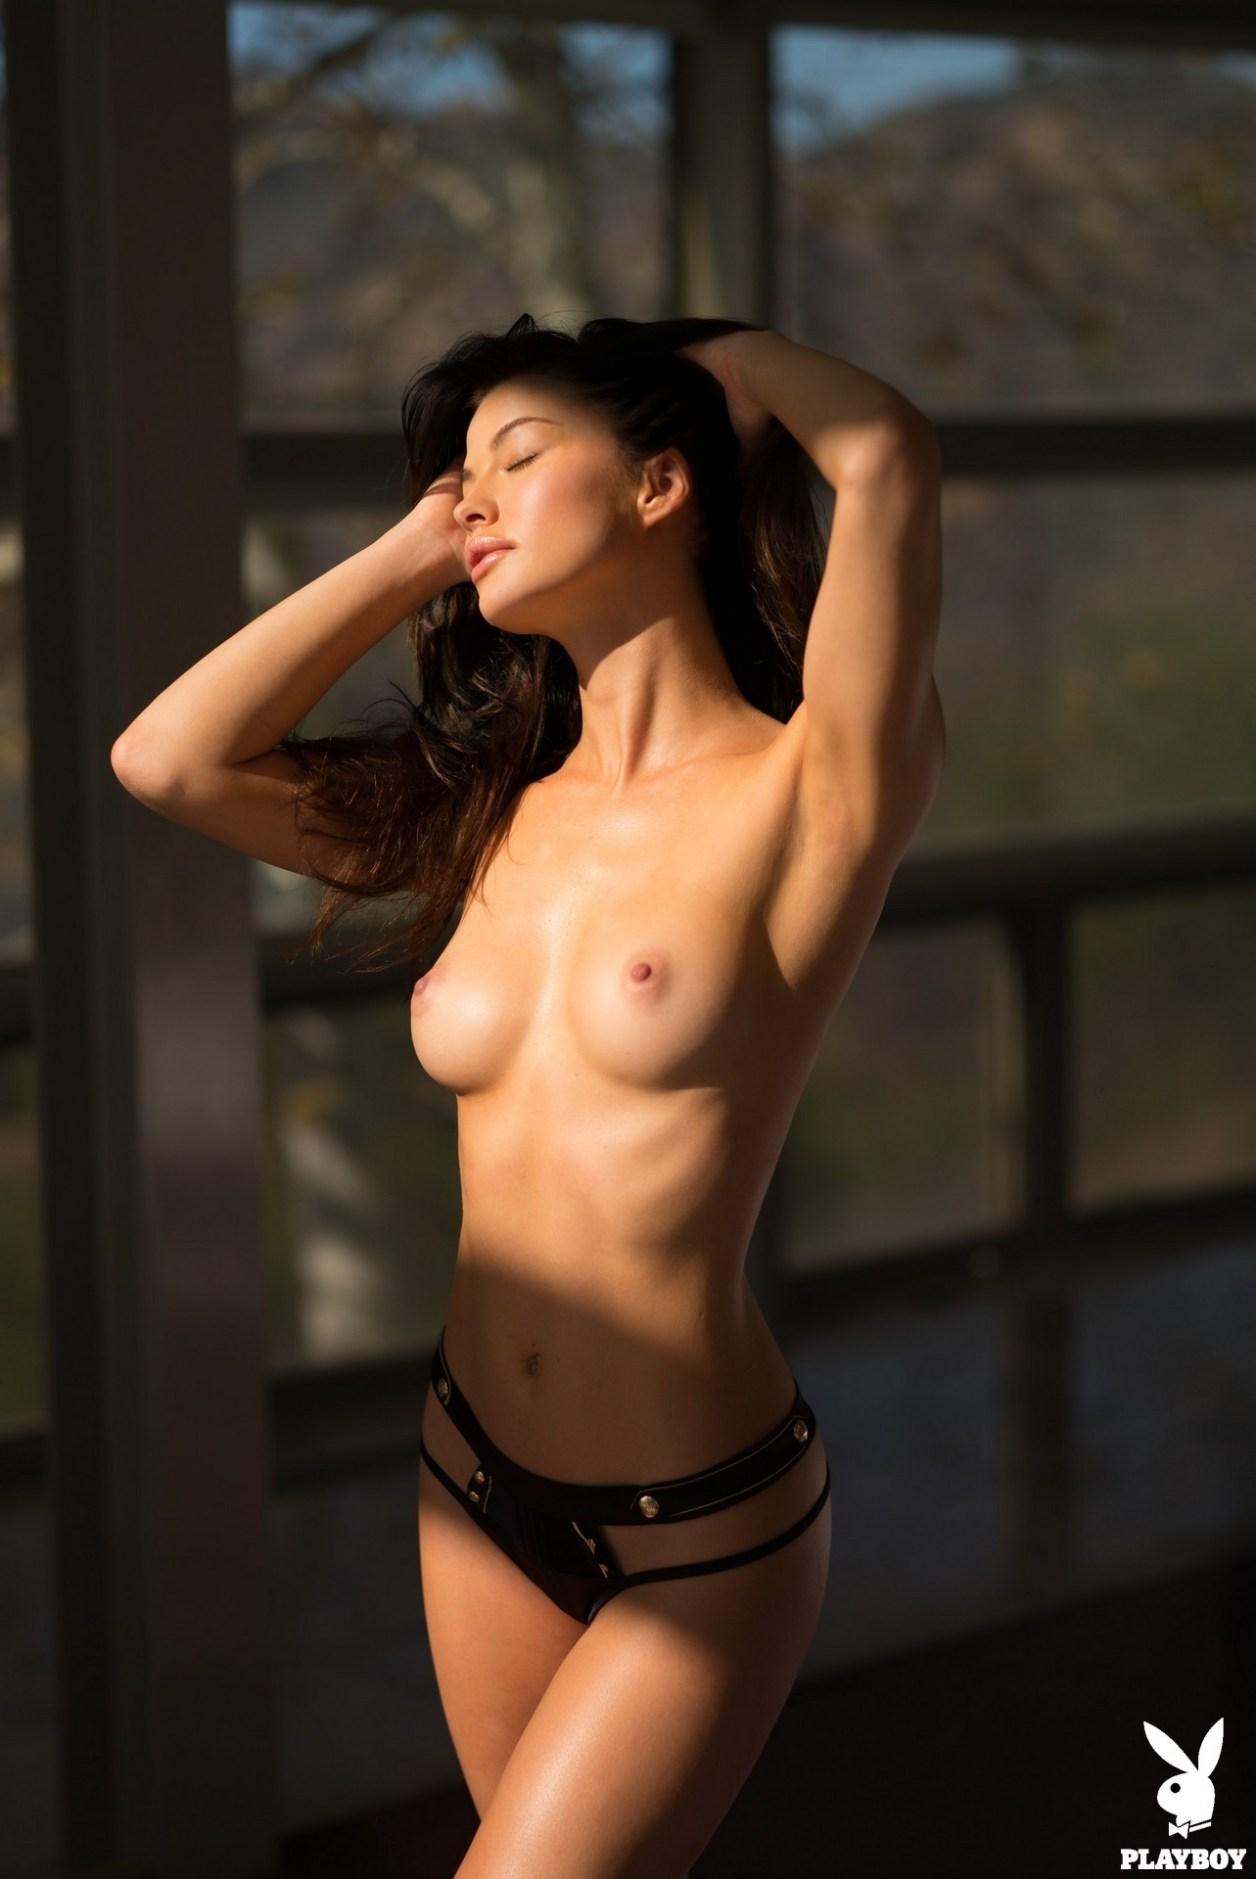 [Playboy plus] Jenny Watwood Playmate March 2018 JWatwoodpm-0004